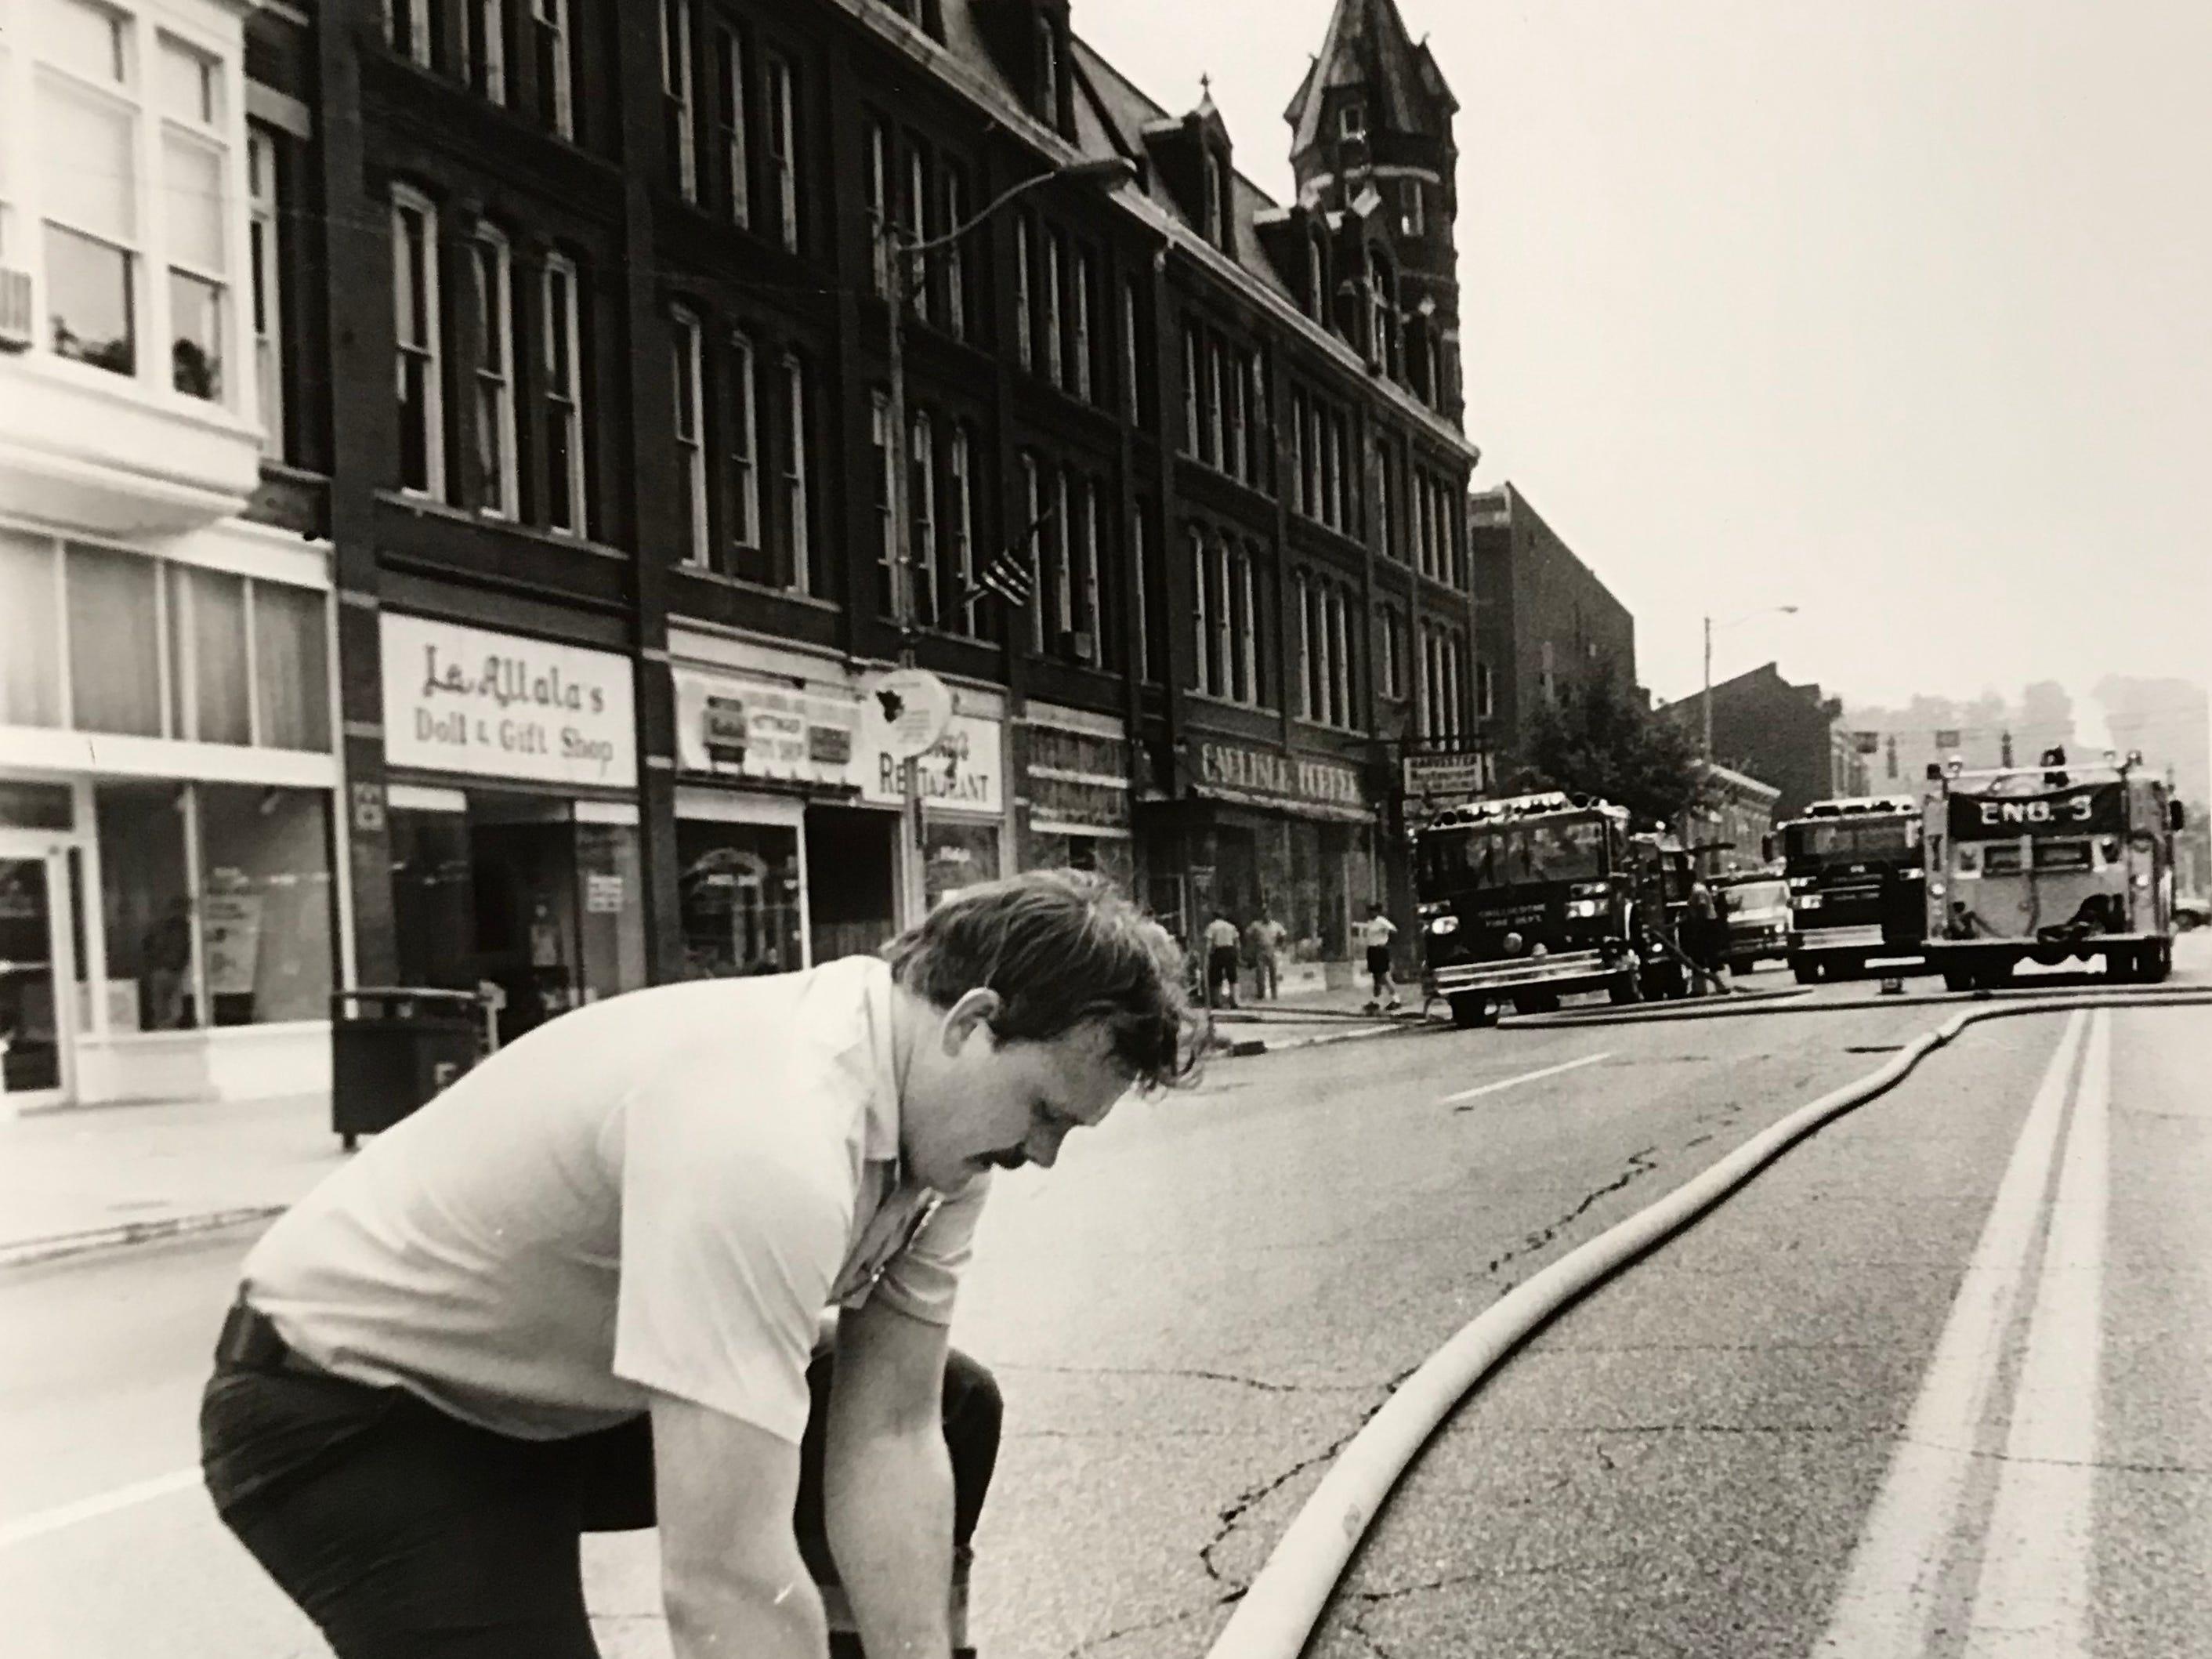 Chillicothe Fire Department, undated Gazette file photo